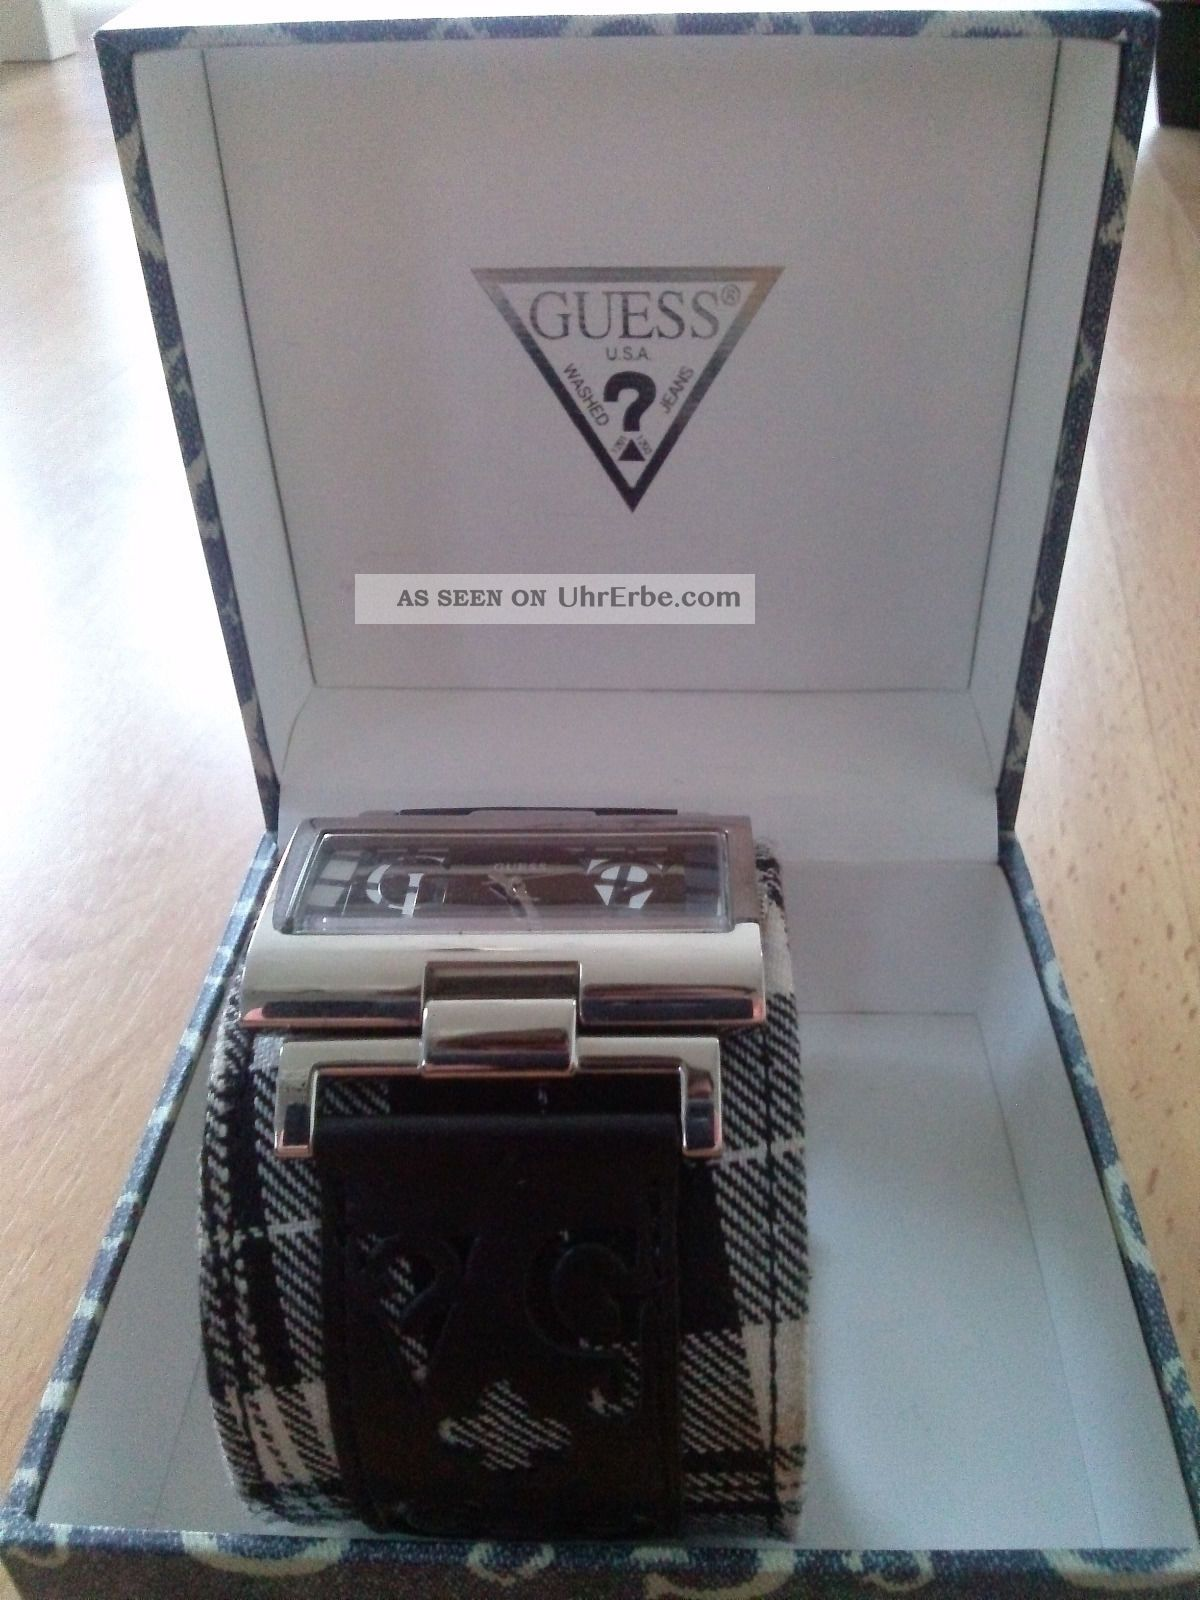 Einzigartige Guess Damen Armbanduhr Mit Tollen Details Armbanduhren Bild